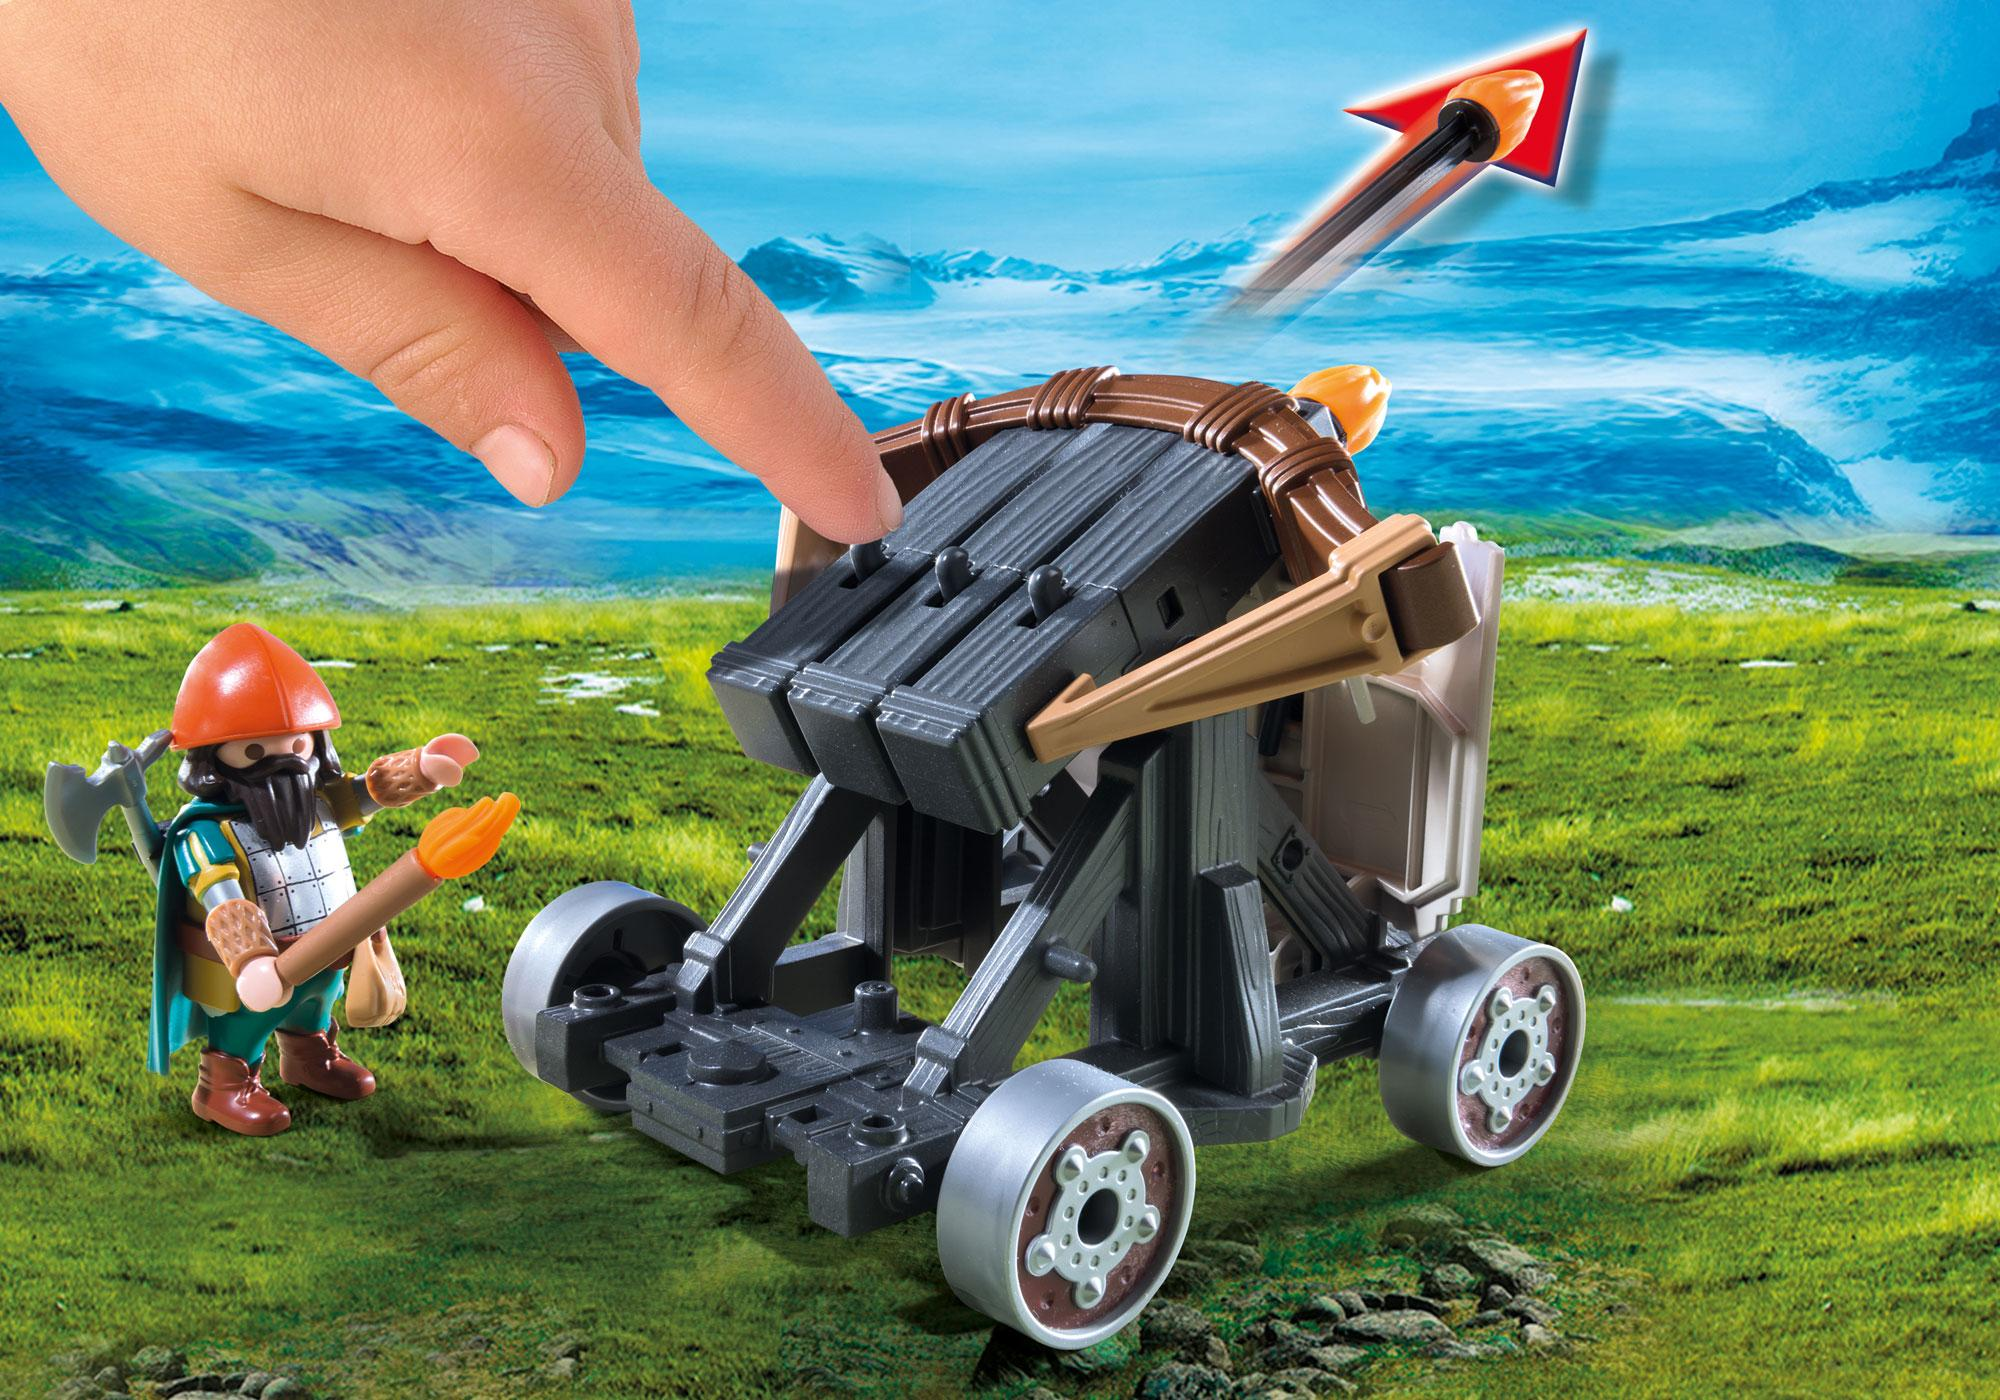 http://media.playmobil.com/i/playmobil/9341_product_extra2/Char de combat avec baliste et nains